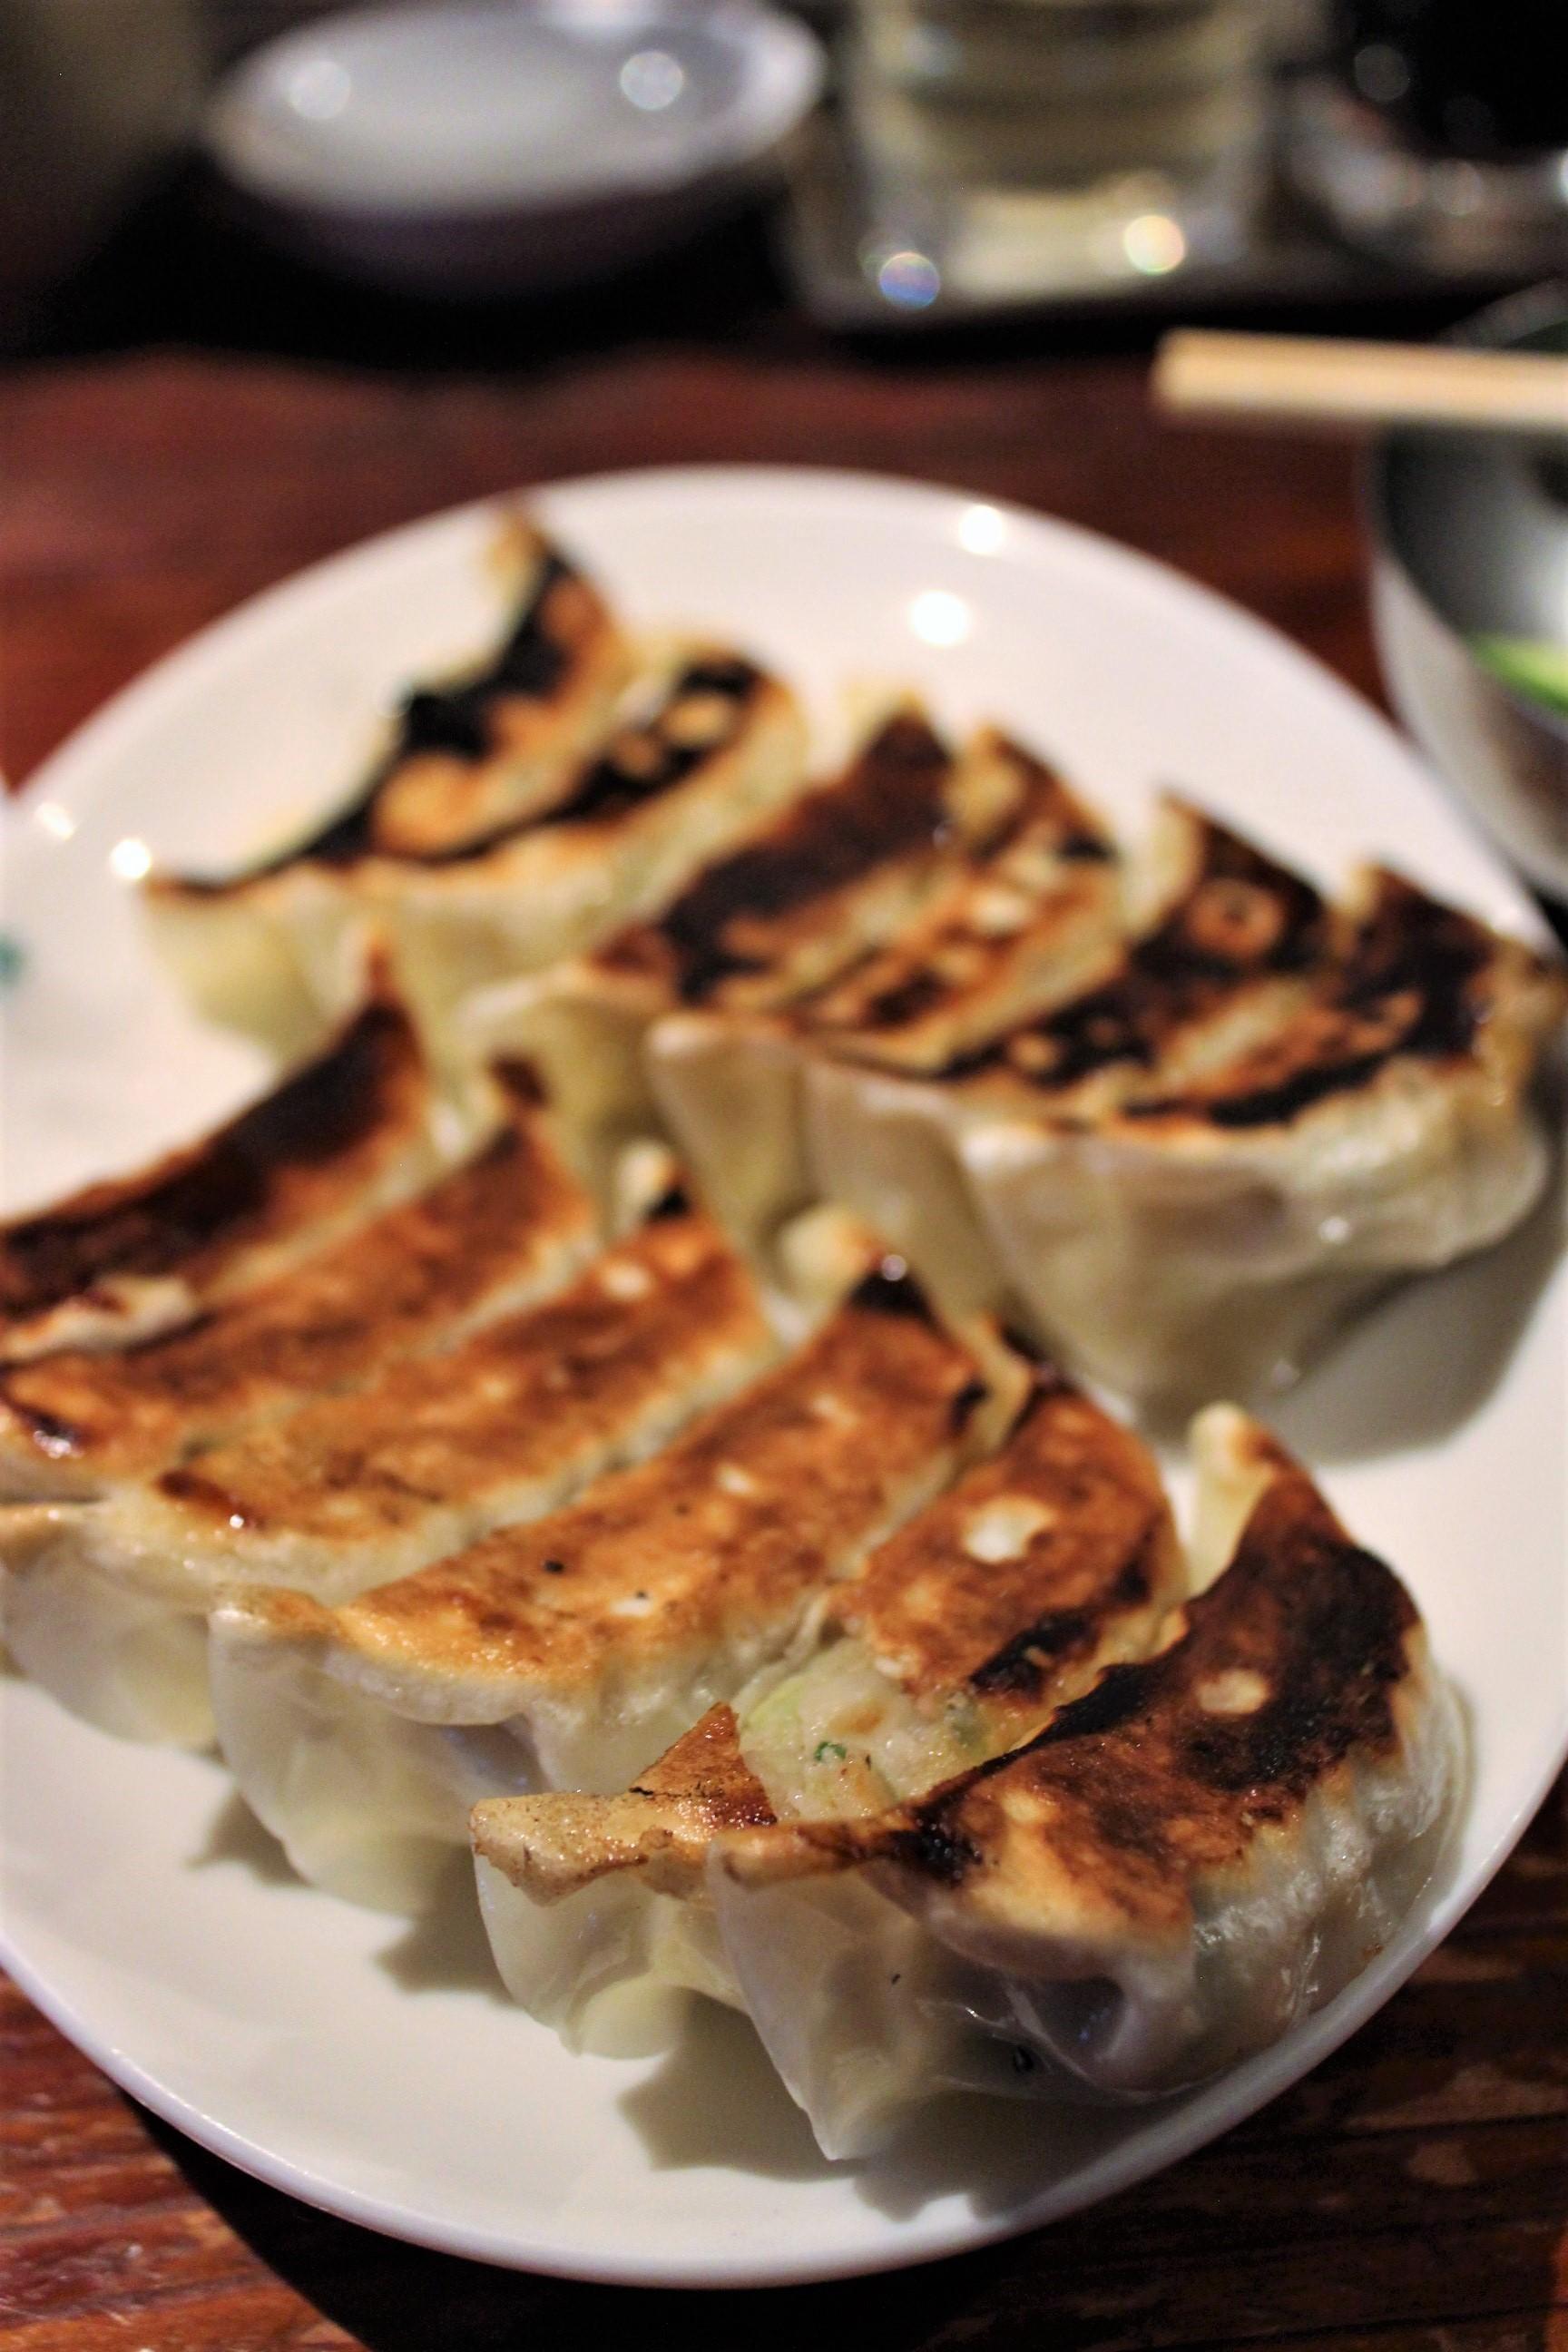 Pan-Fried Dumplings with Garlic & Chives